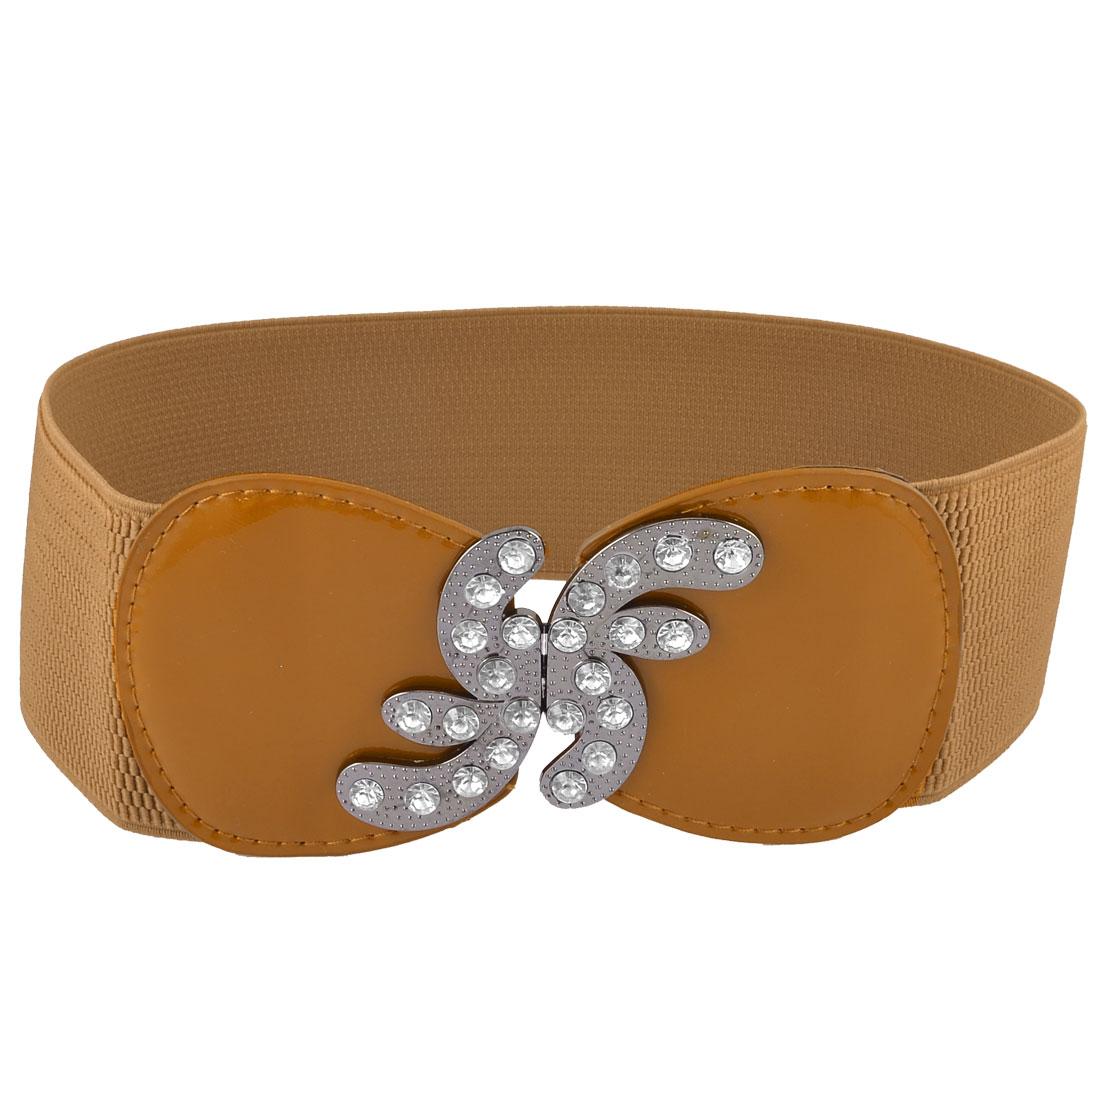 Lady Brown Gray Rhinestones Interlocking Buckle Faux Leather Cinch Waist Belt 7.5CM Wide